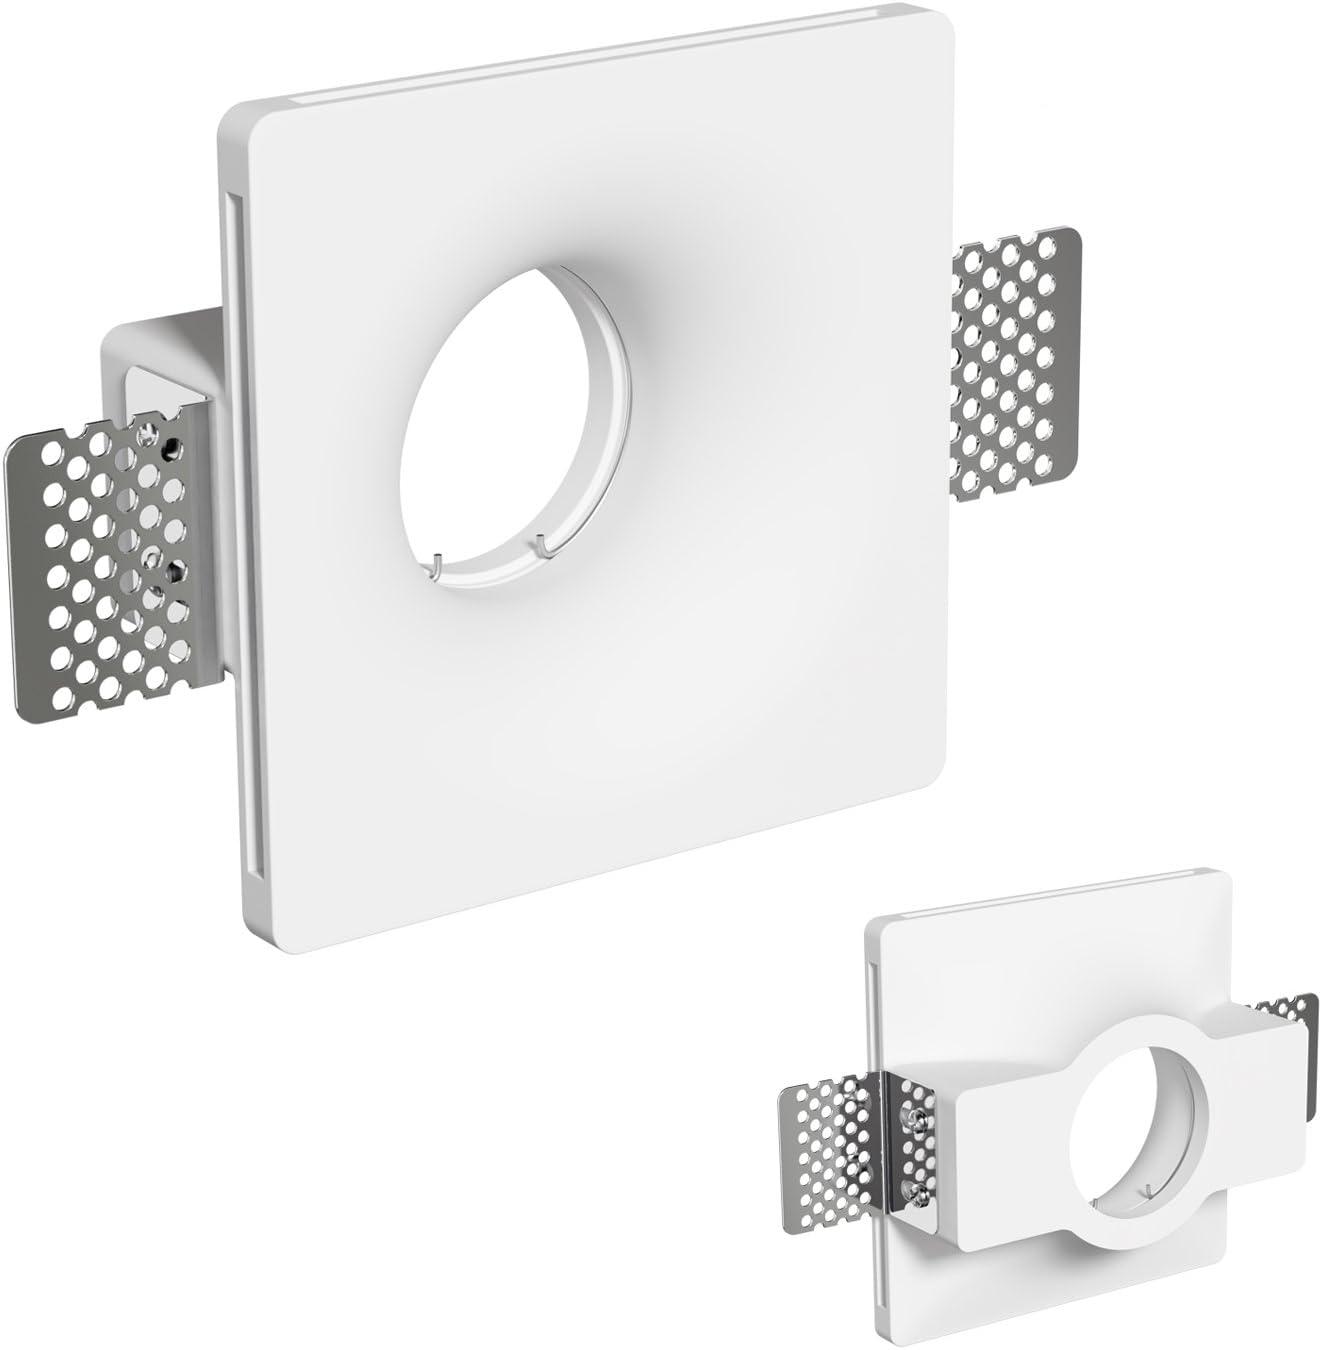 ledscom.de Gips Einbaustrahler GIDS DIY inkl. GU10 Lampe 340lm weiß 6er Set 10er-set